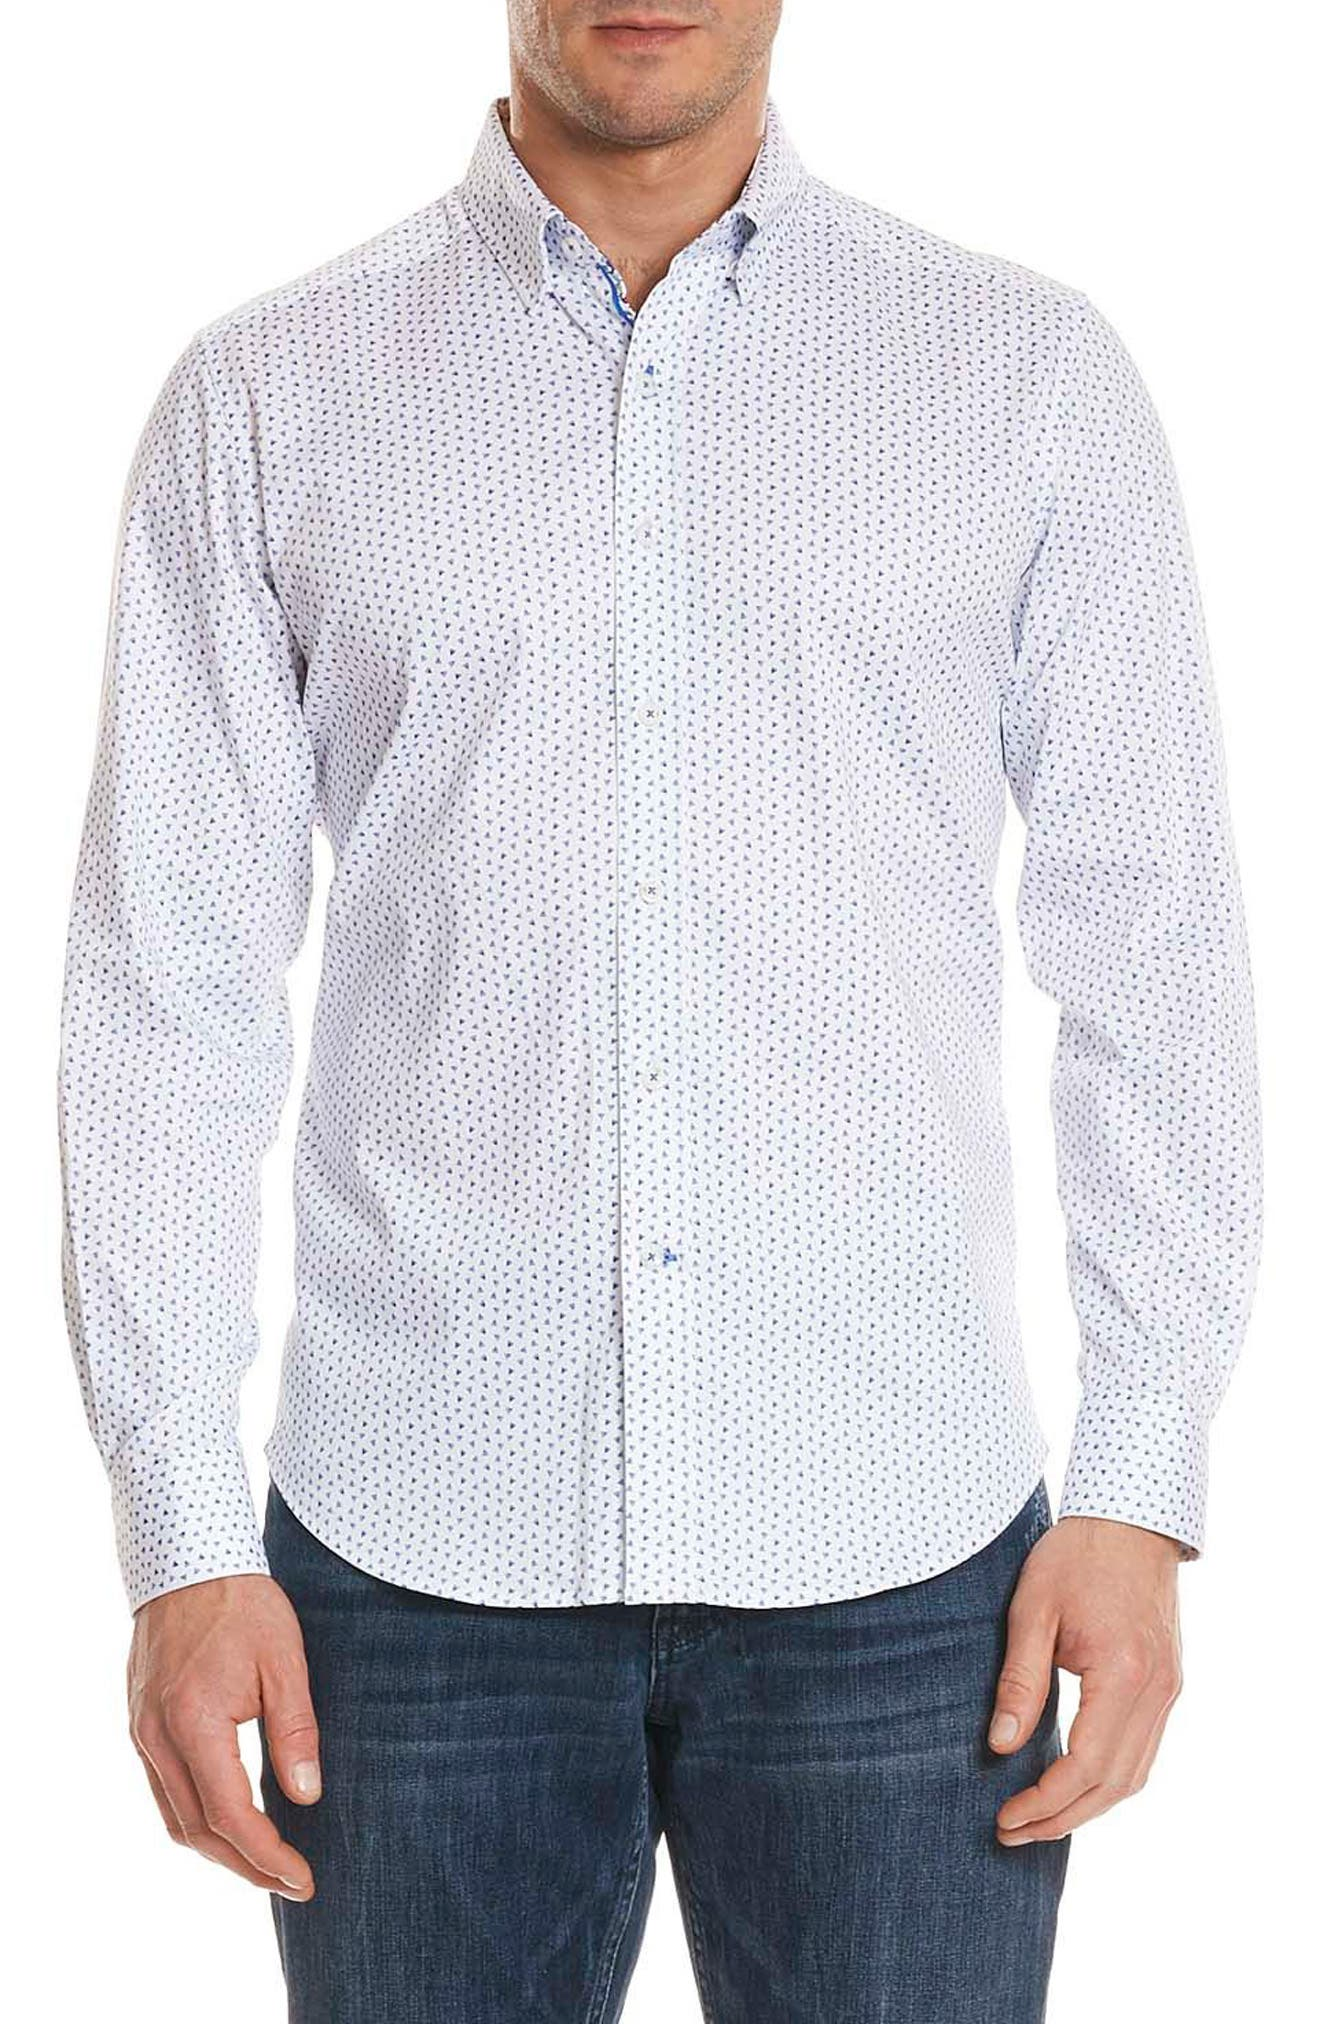 Mitchel Tailored Fit Sport Shirt,                         Main,                         color, Blue